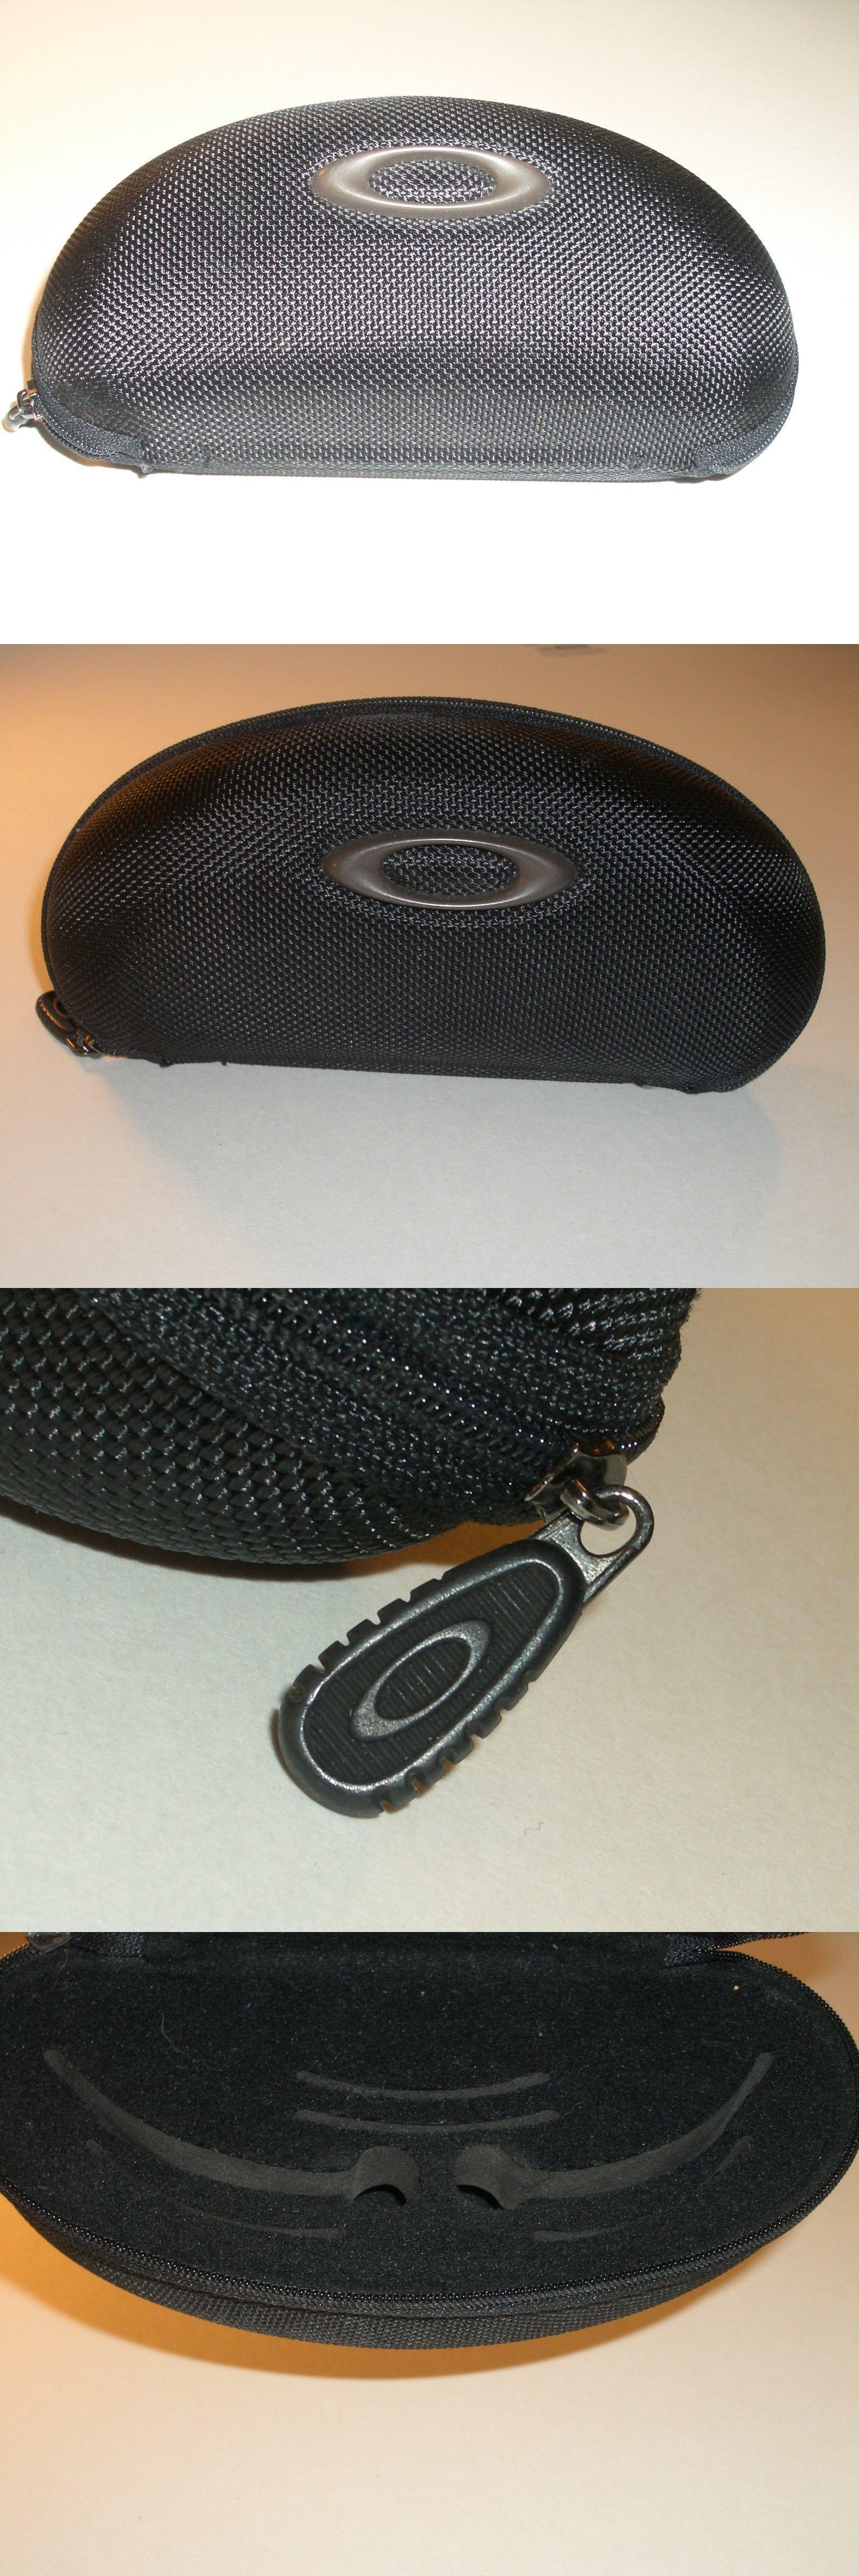 9cc350b832 Eyewear Accessories 179249  Brand New Original Oakley Black Color Zipped  Sunglasses Case Only New -